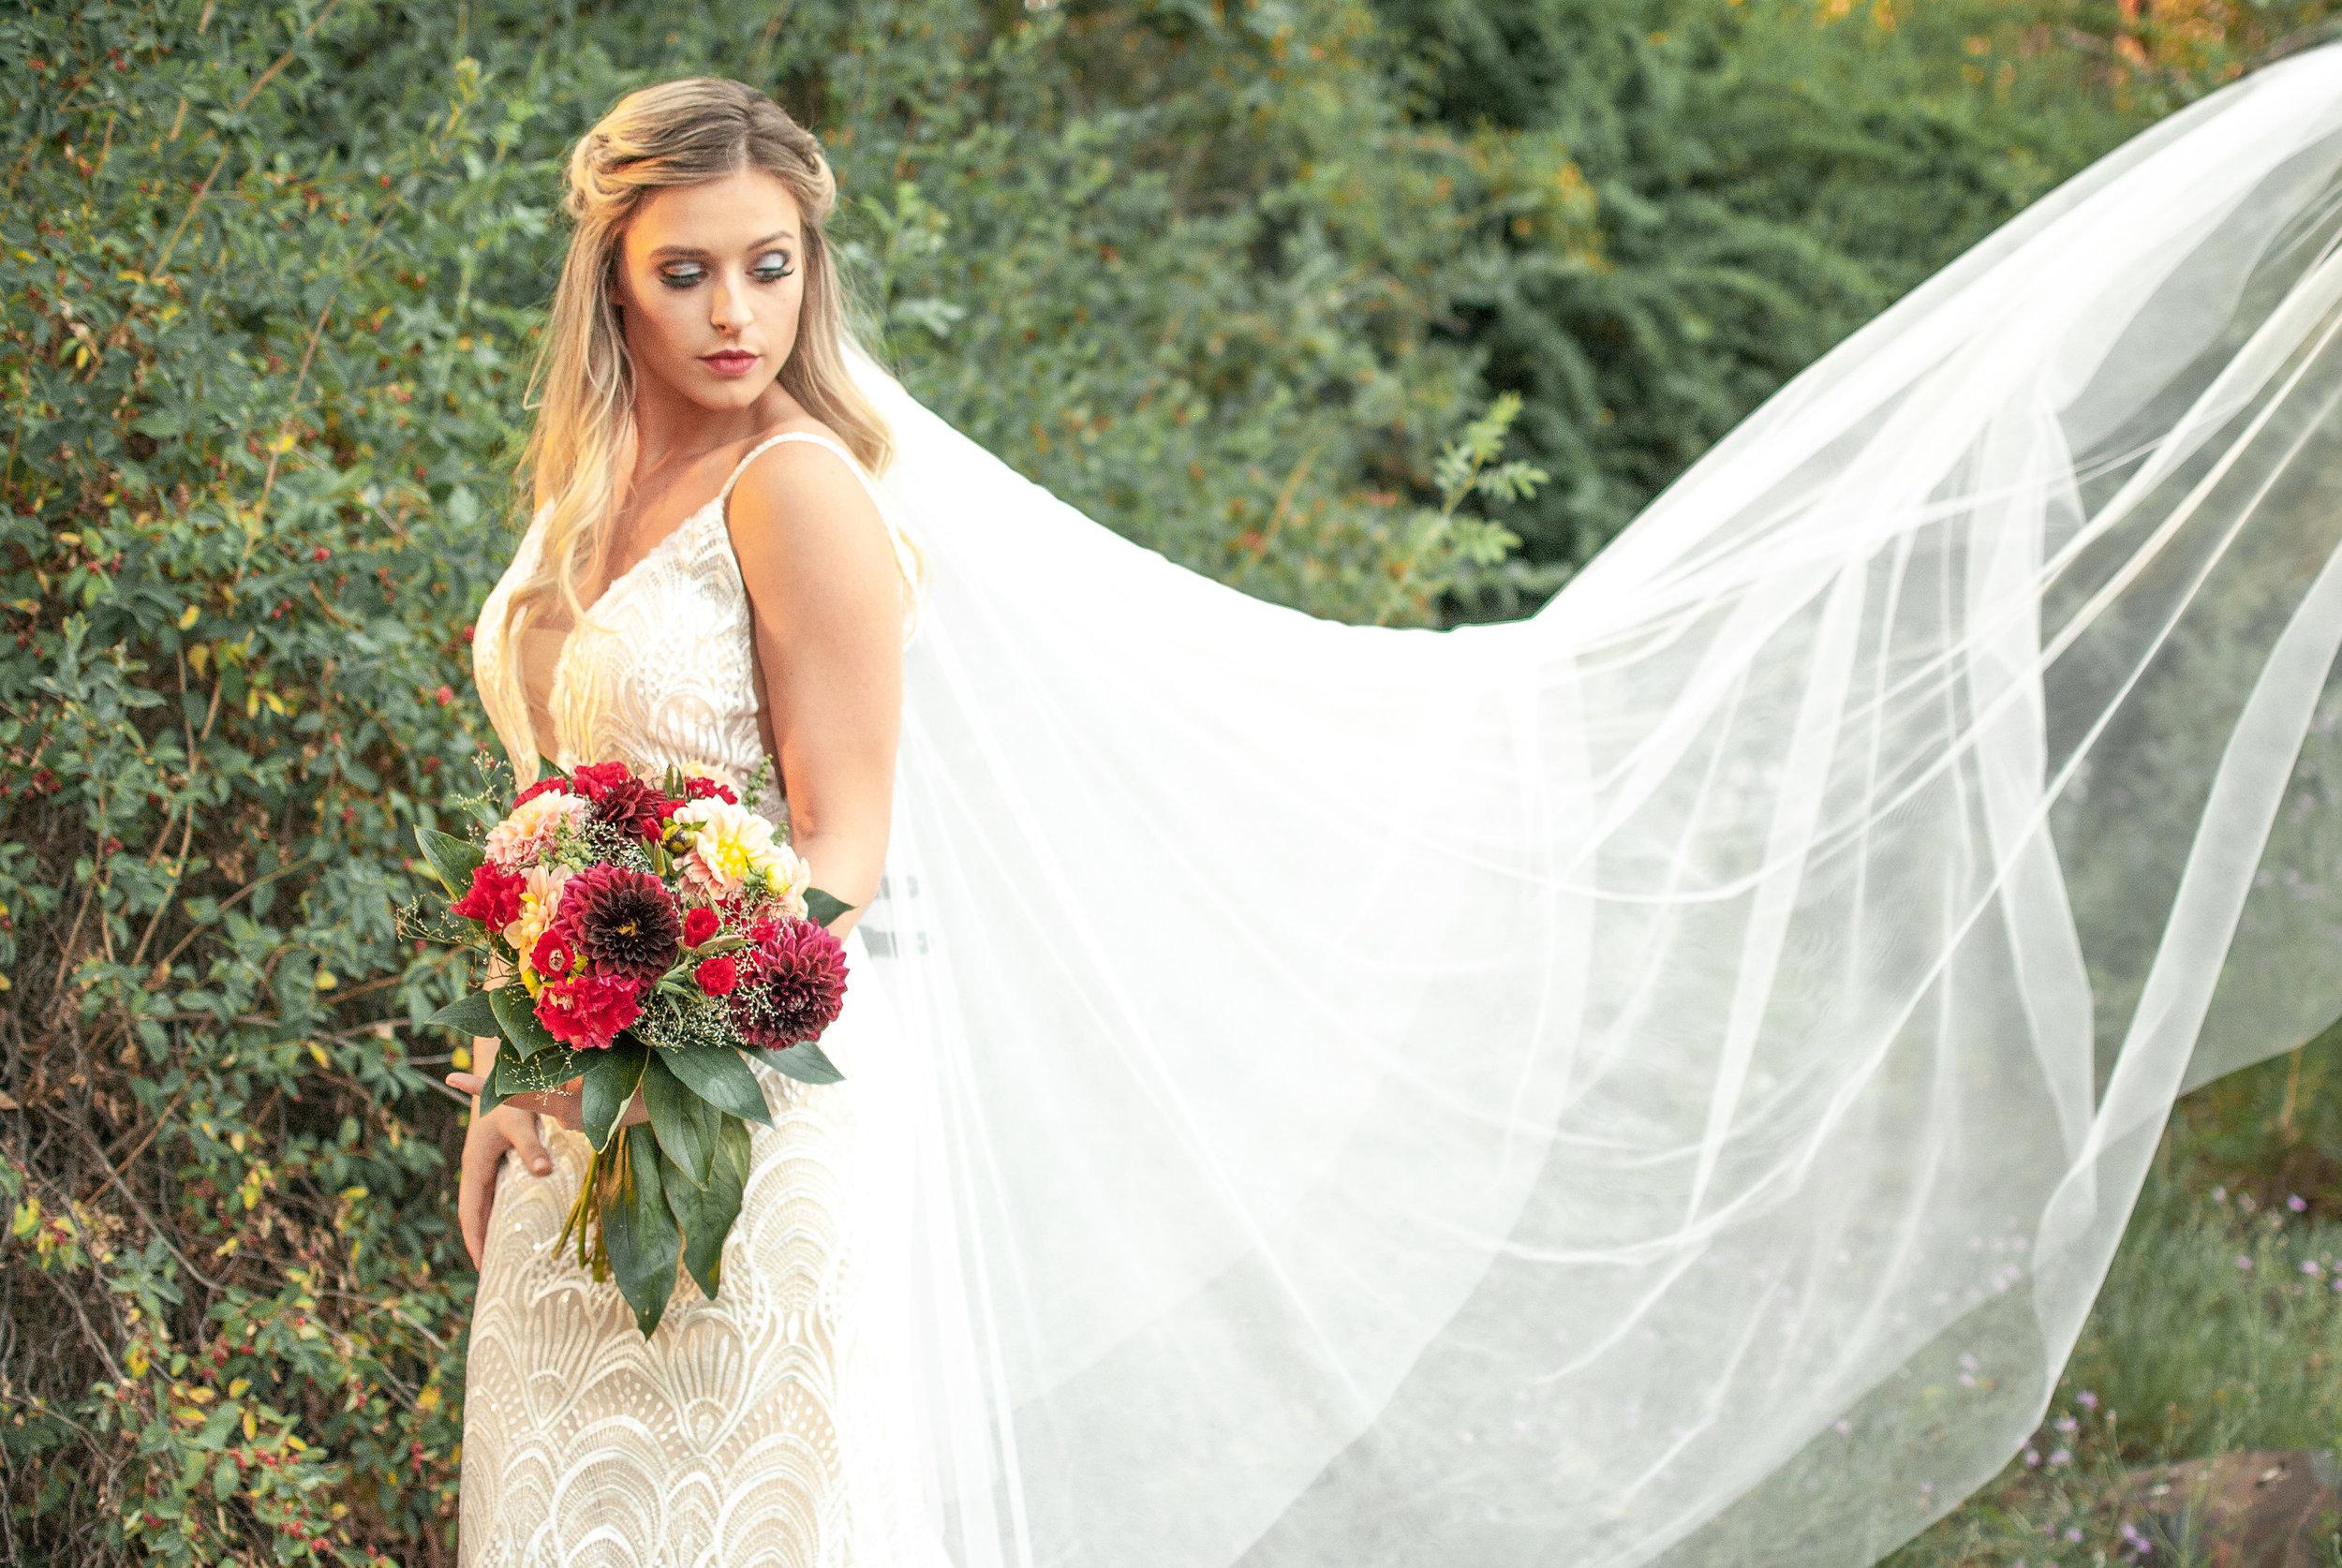 veil in the air image wedding dress spokane